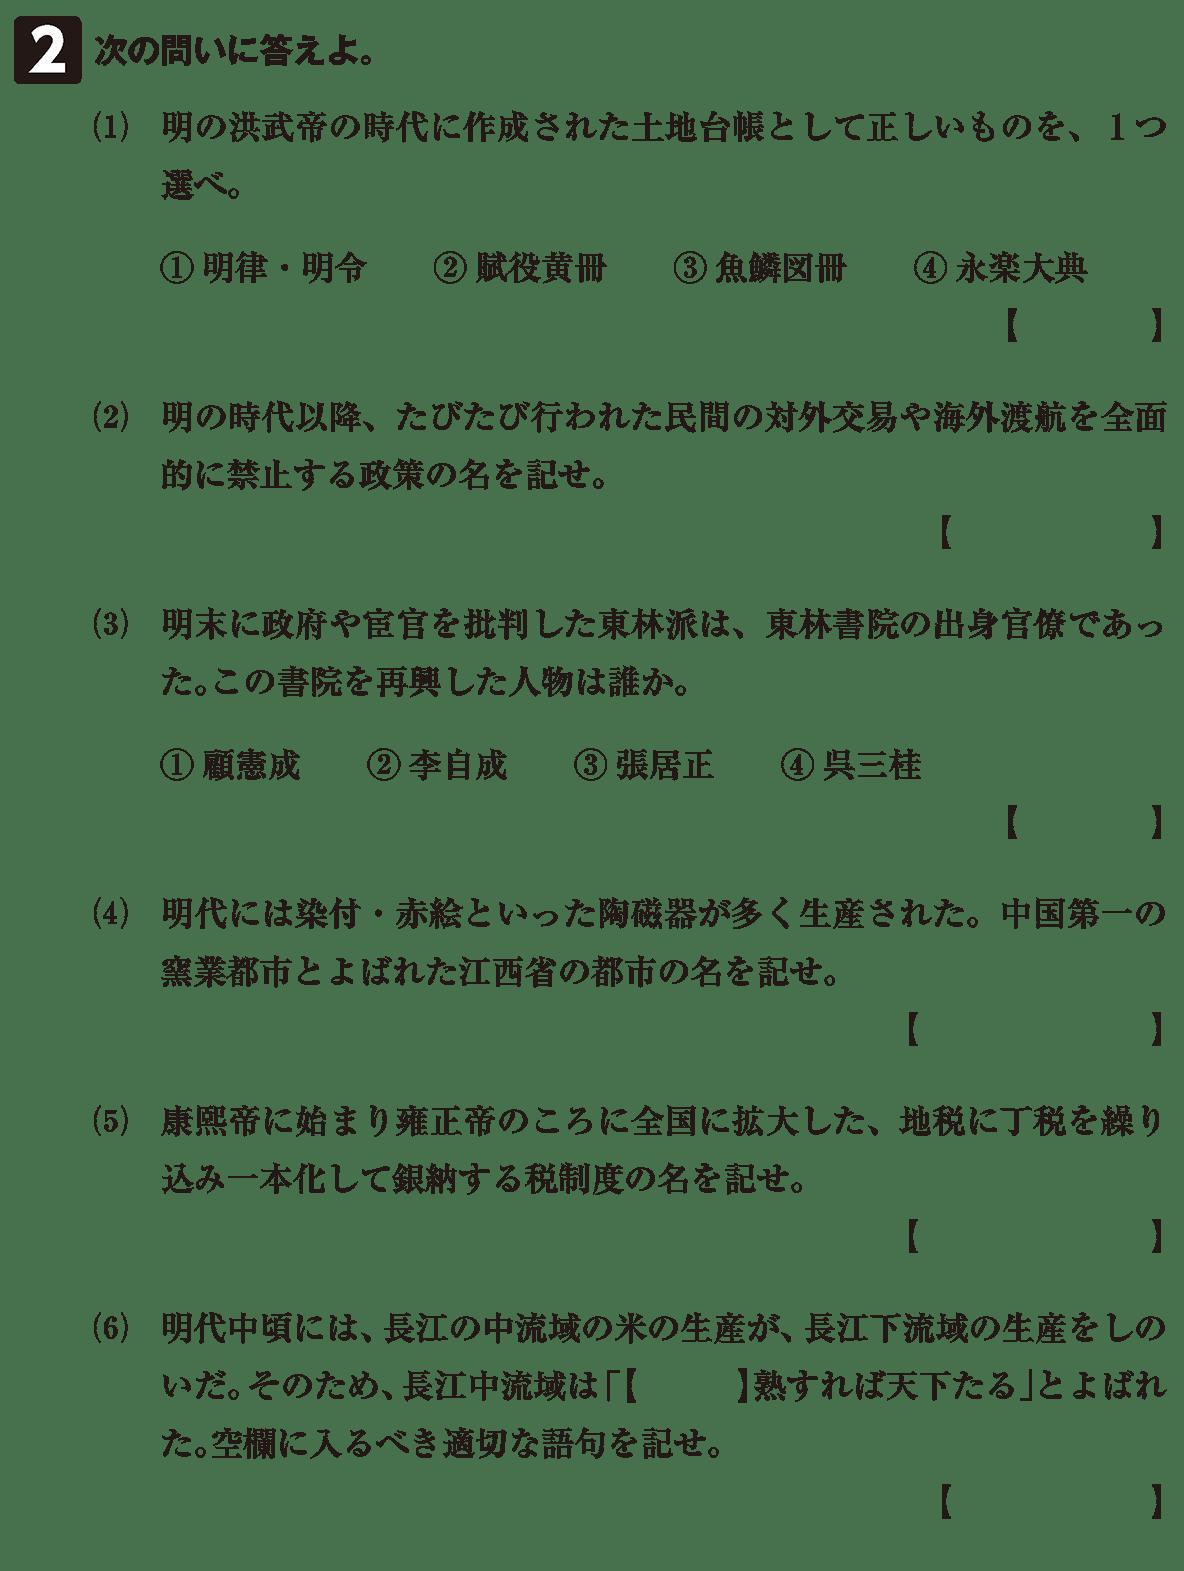 高校世界史 明・清の時代9 確認テスト(後半)問題2